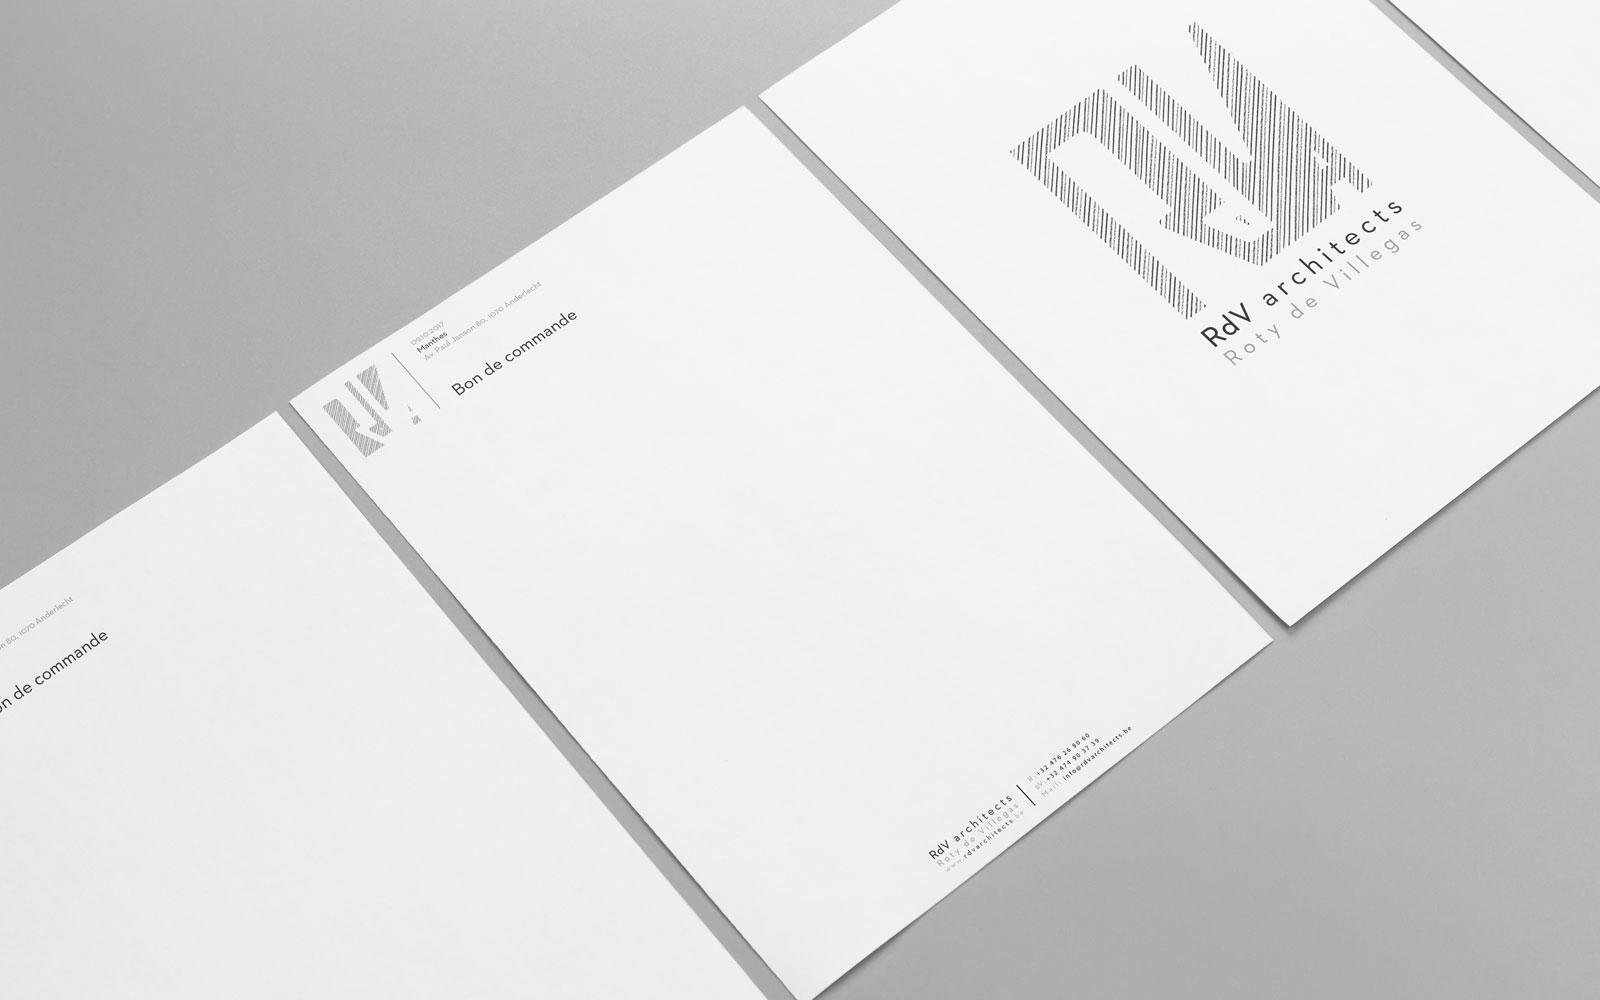 BL-Graphics - RdvArchi - document